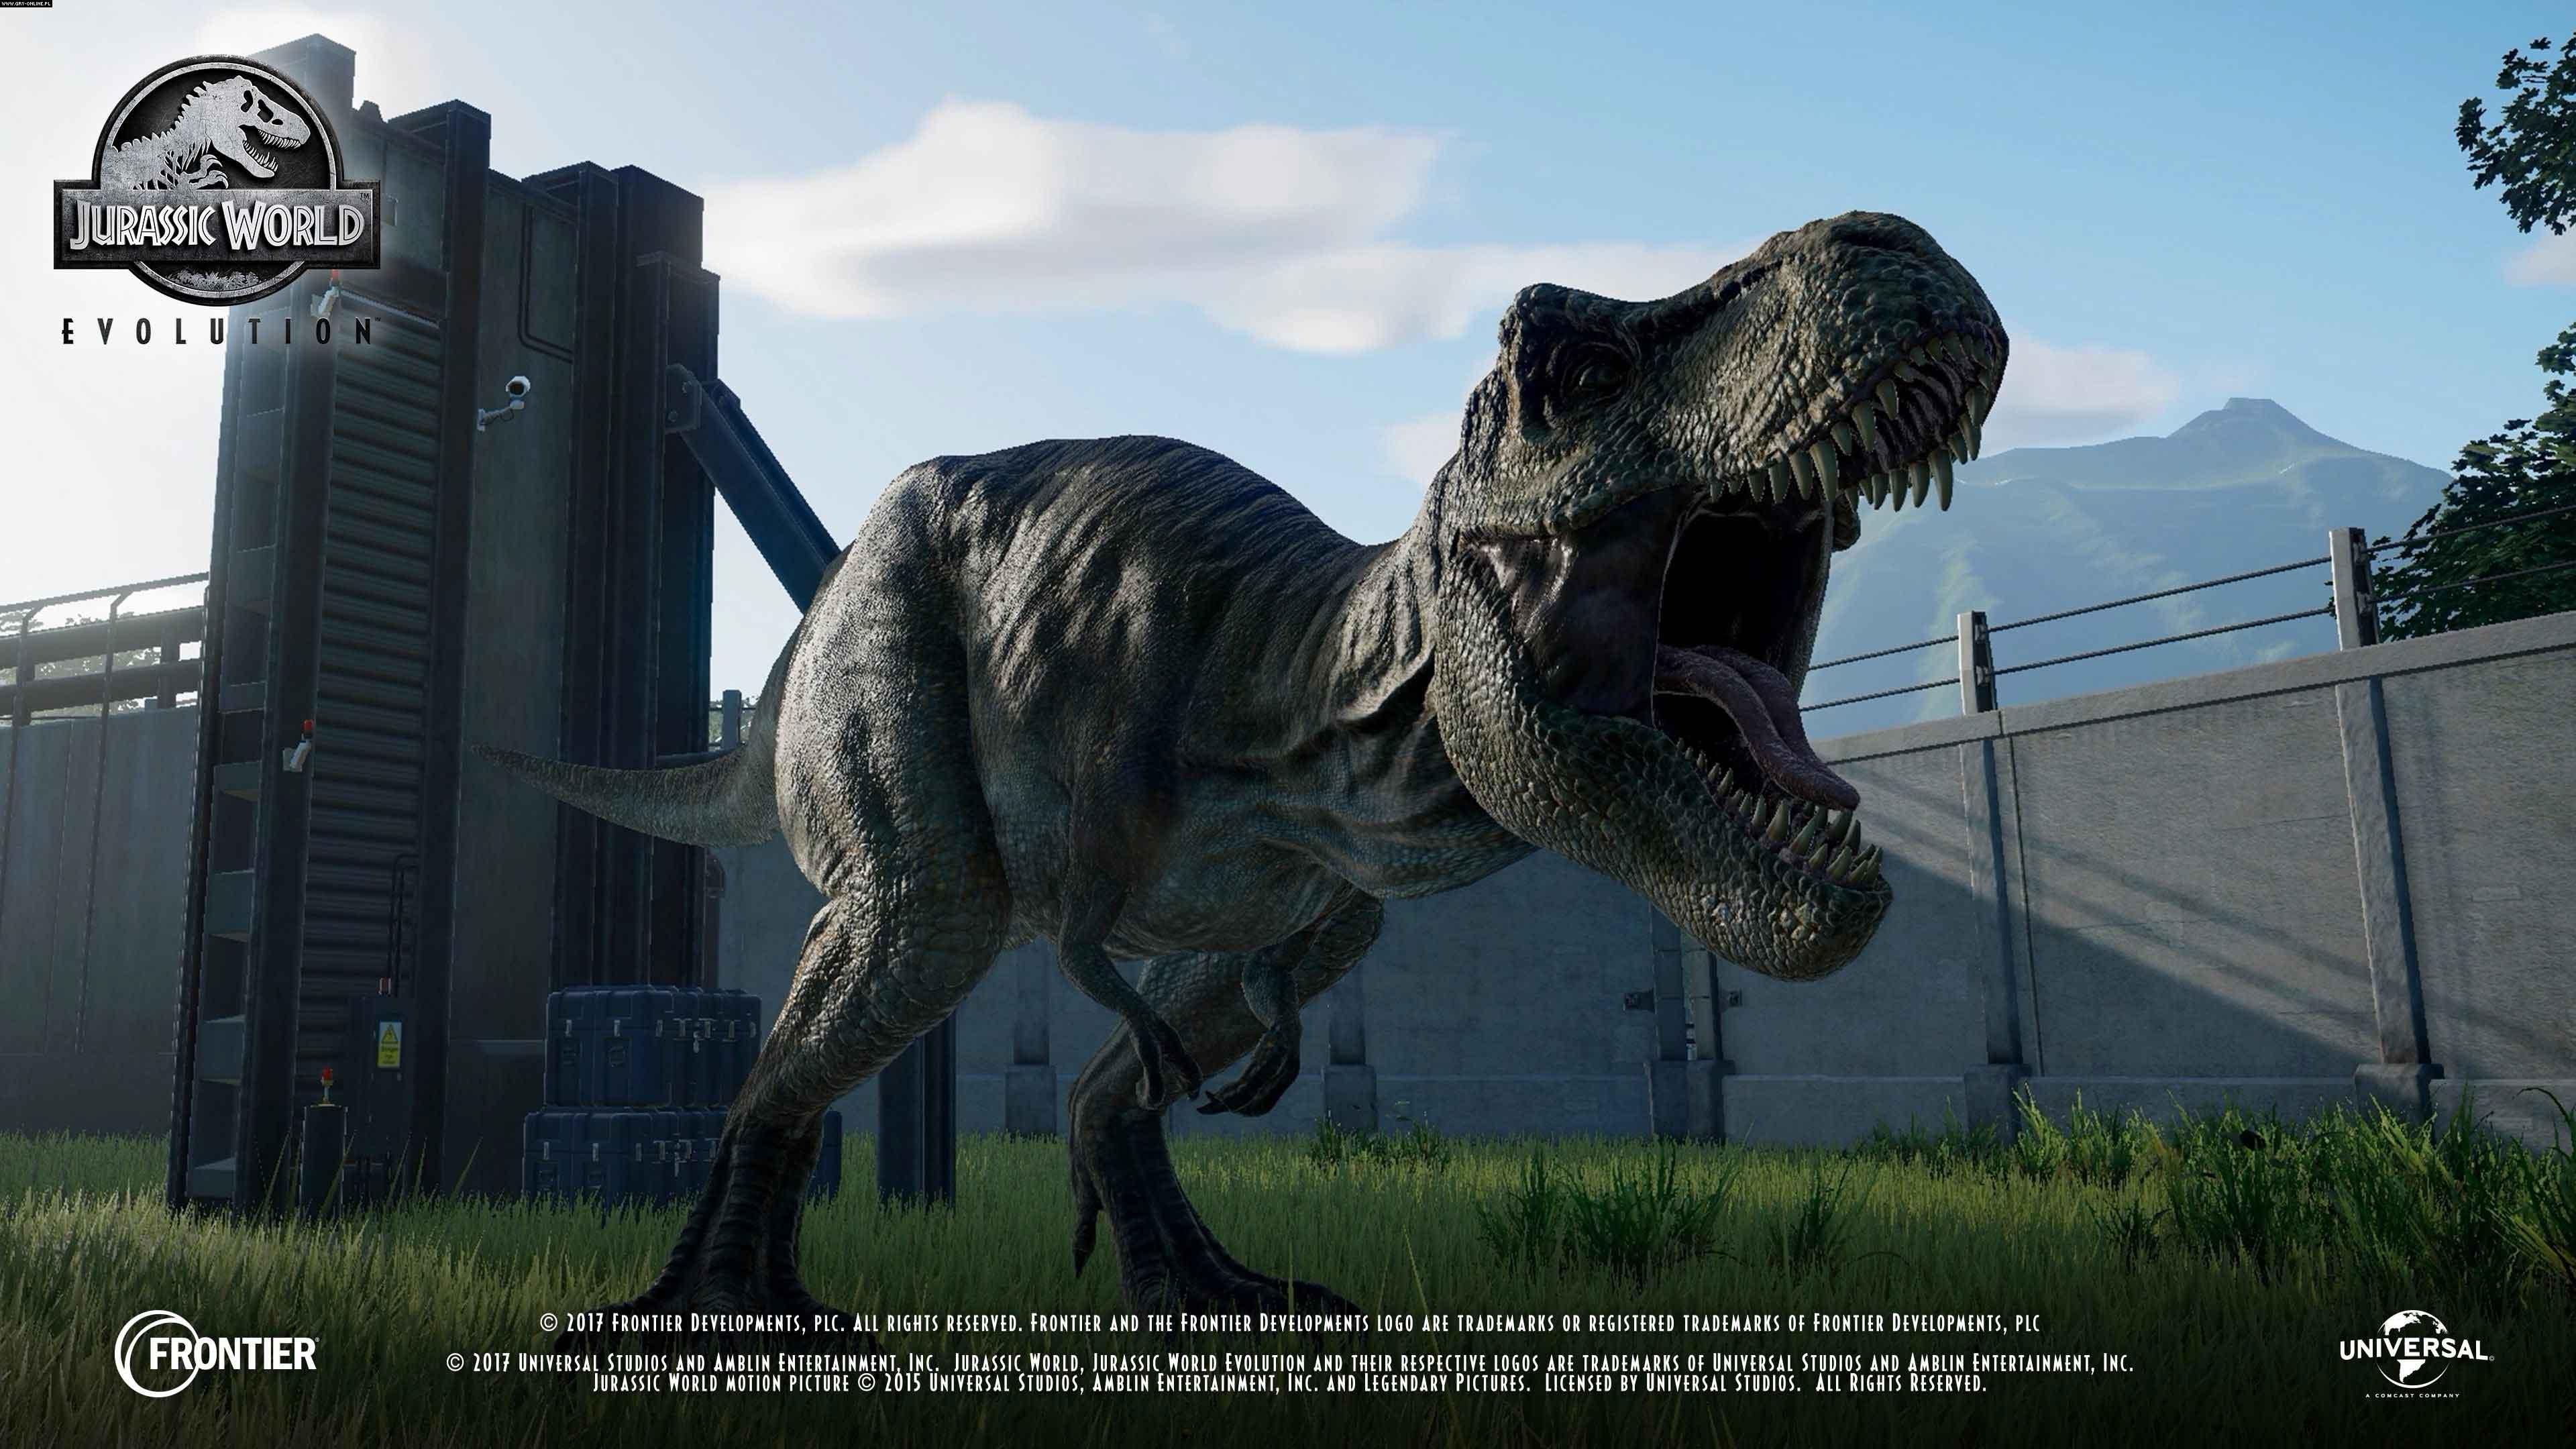 Jurassic World: Evolution for PS4 screenshot